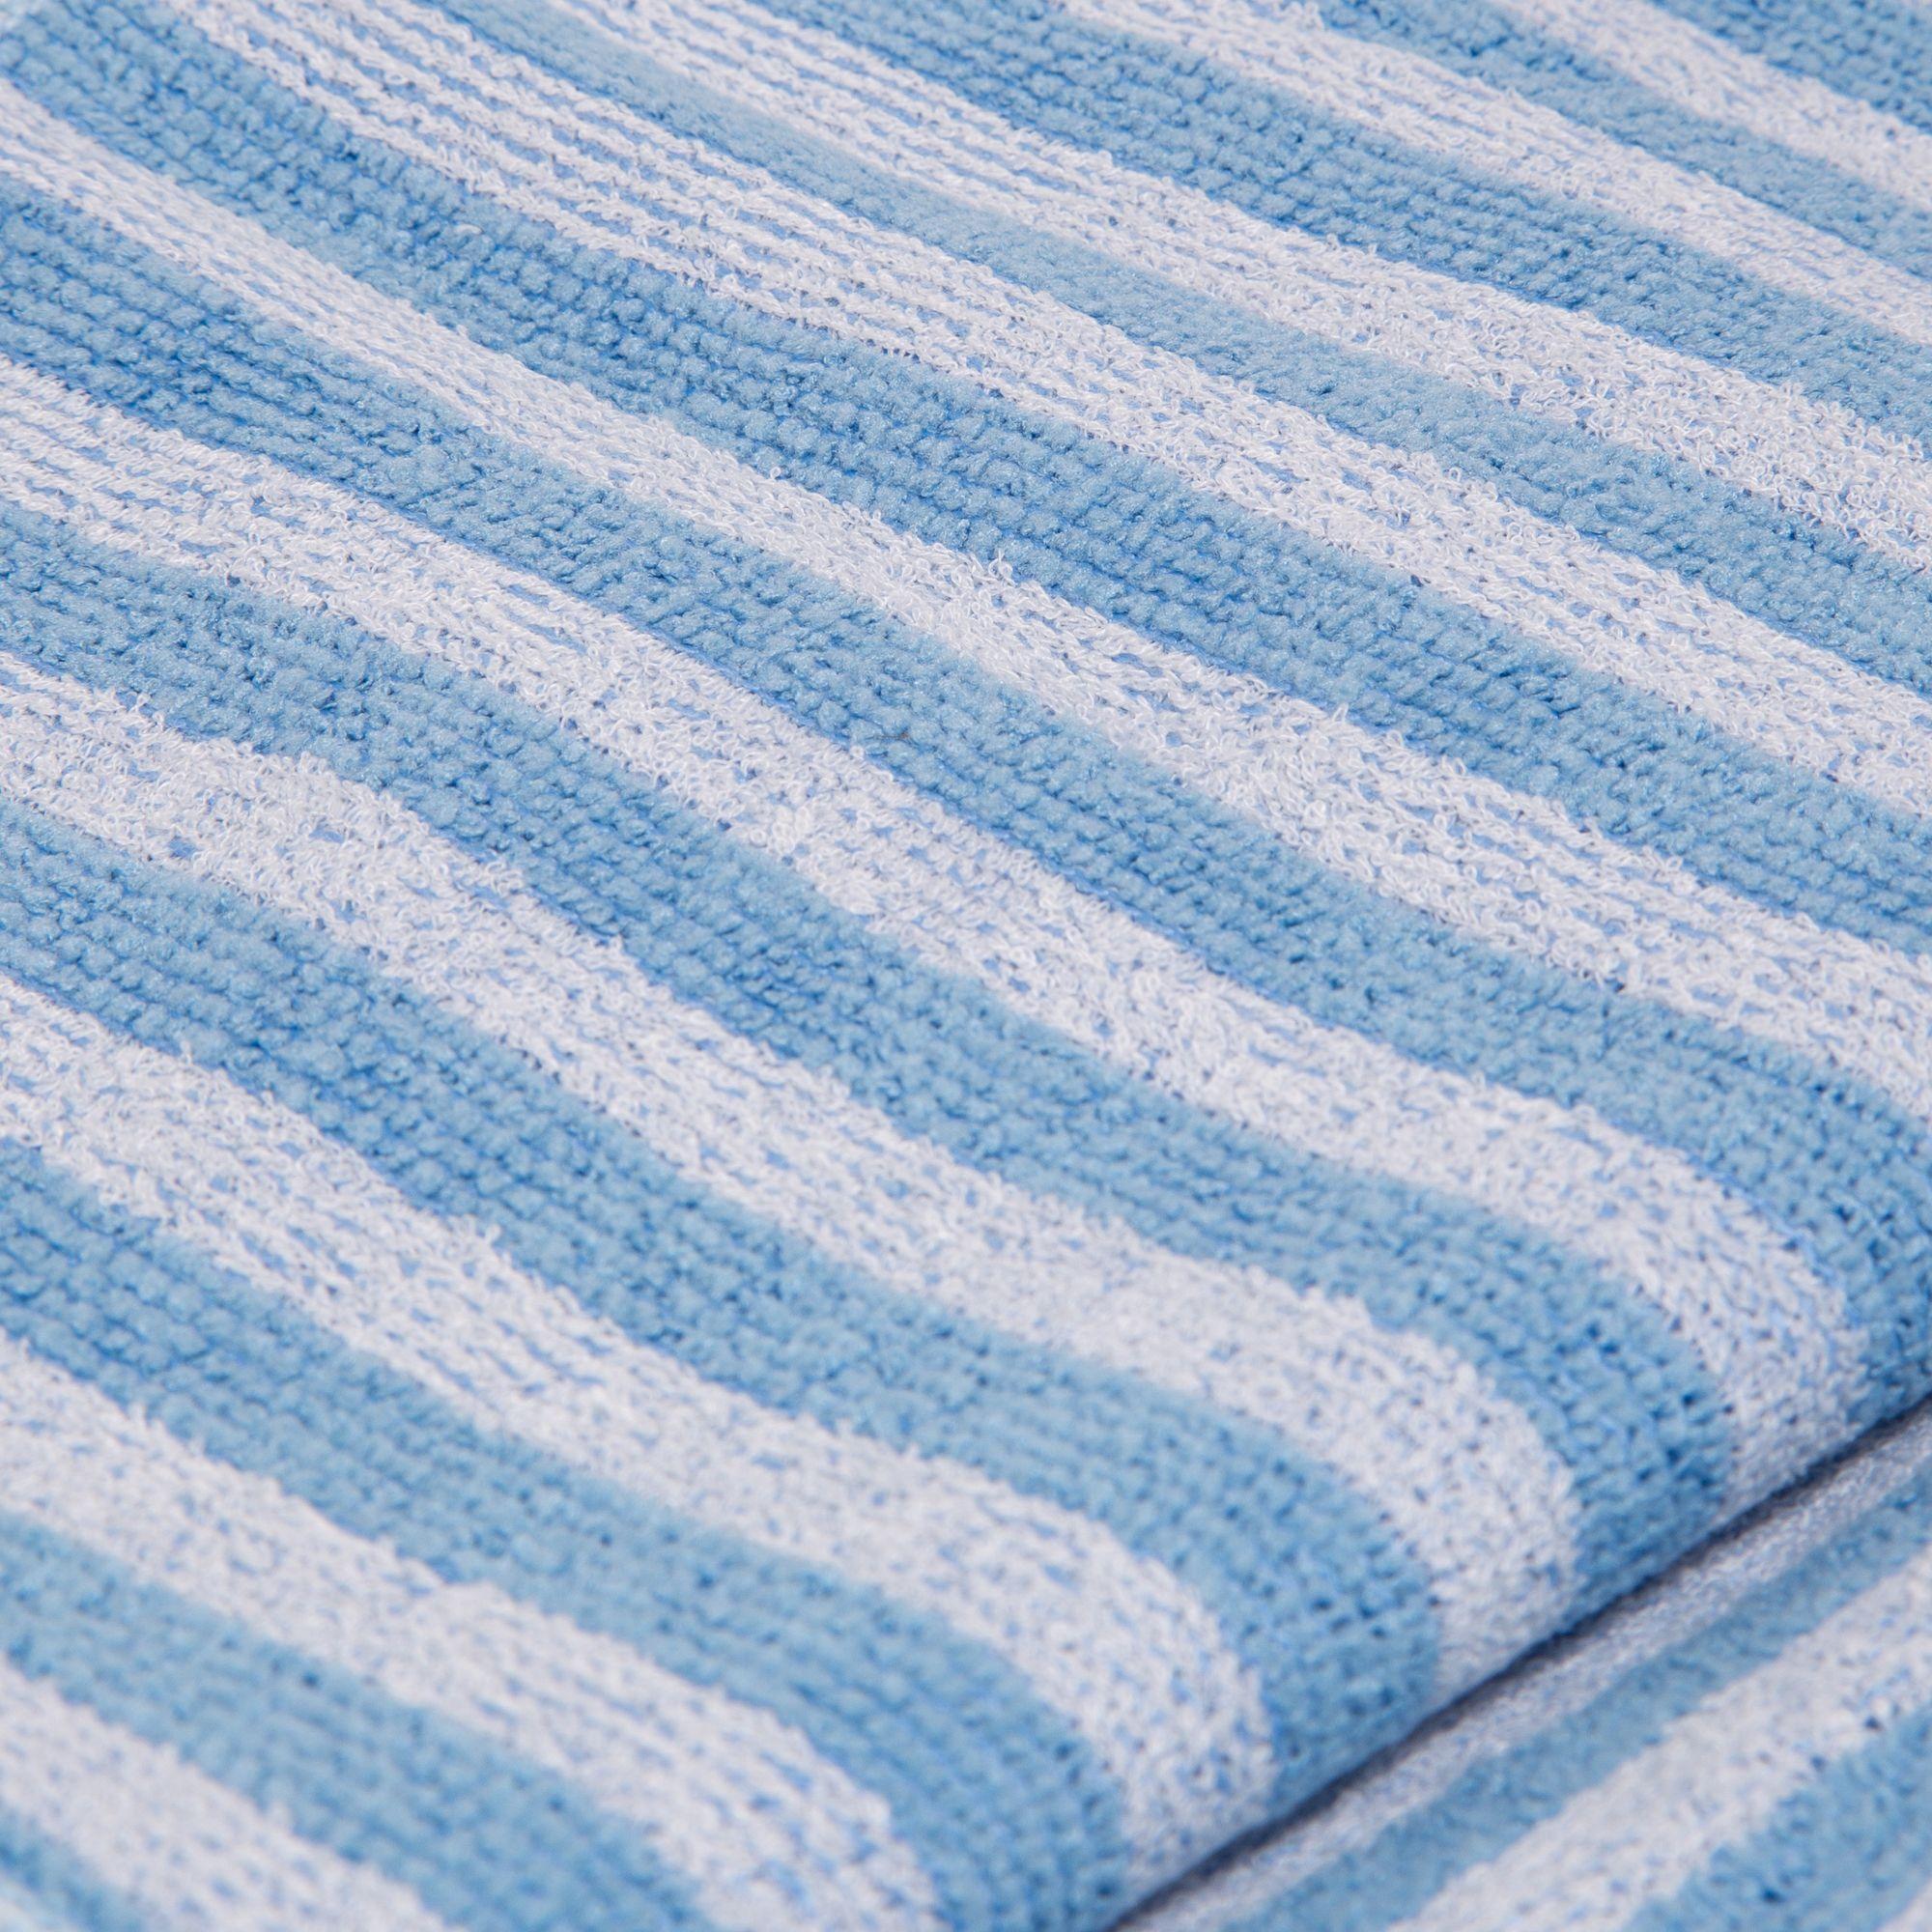 DAS BLAUE WUNDER® Extra Bodentücher mit Bambusfaser extrem saugfähig 20tlg.    QVC.de